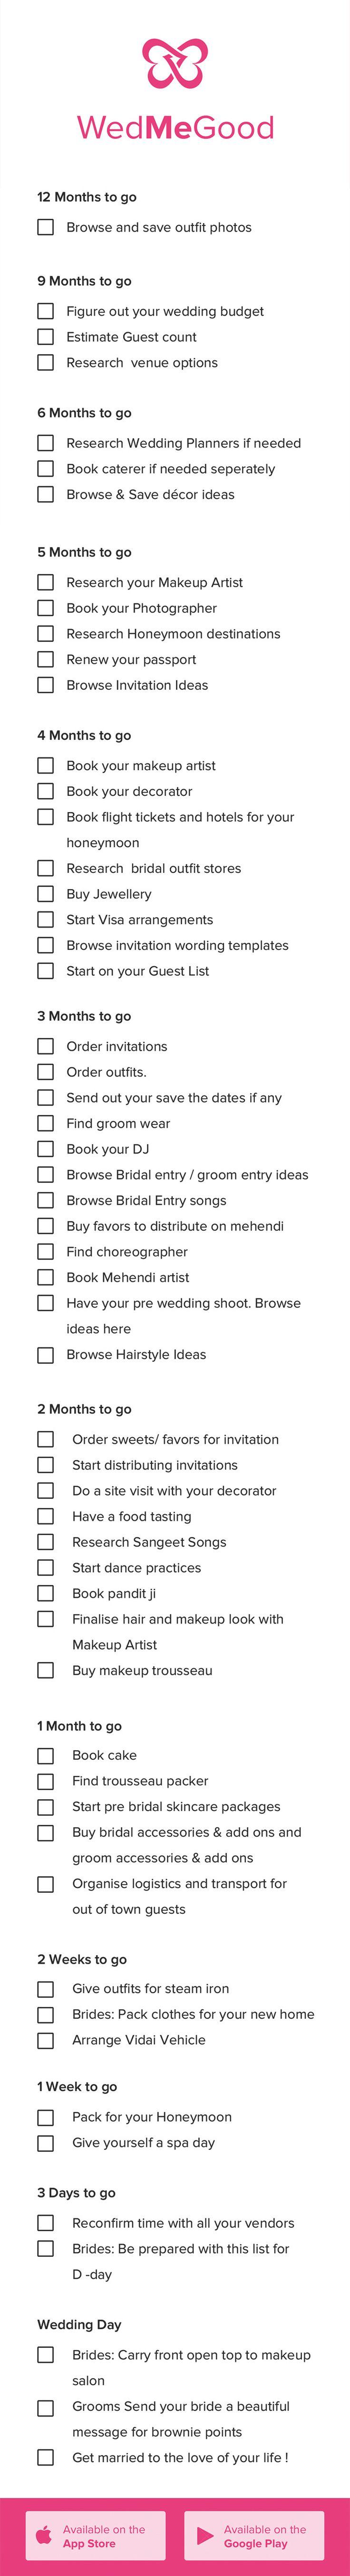 Indian Wedding Checklist . WedMeGood Checklist - Things to Do 1 Year Checklist for a Bride to Be | WedMeGood | #bride2be #checklist #indianwedding #indianbride #bride #wedmegood